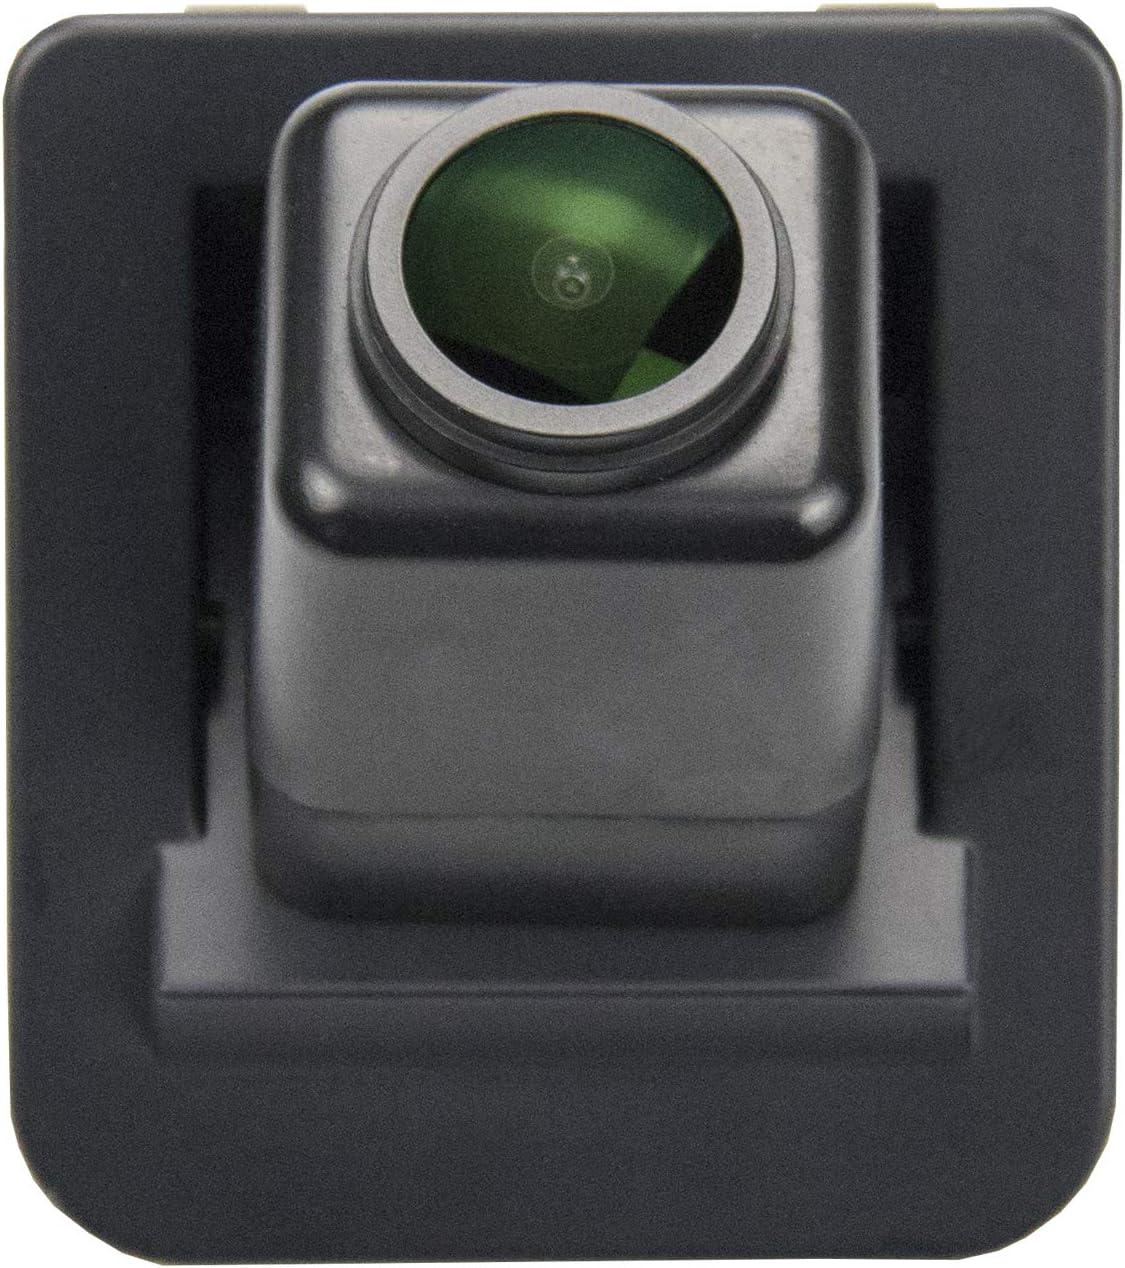 HD 1280x720p Reversing Camera for Mercedes Benz S E C Class S300 400 X204 W204 W212 W221 W216 in Original Reverse Hole Rear View Backup Camera Waterproof Night Vision